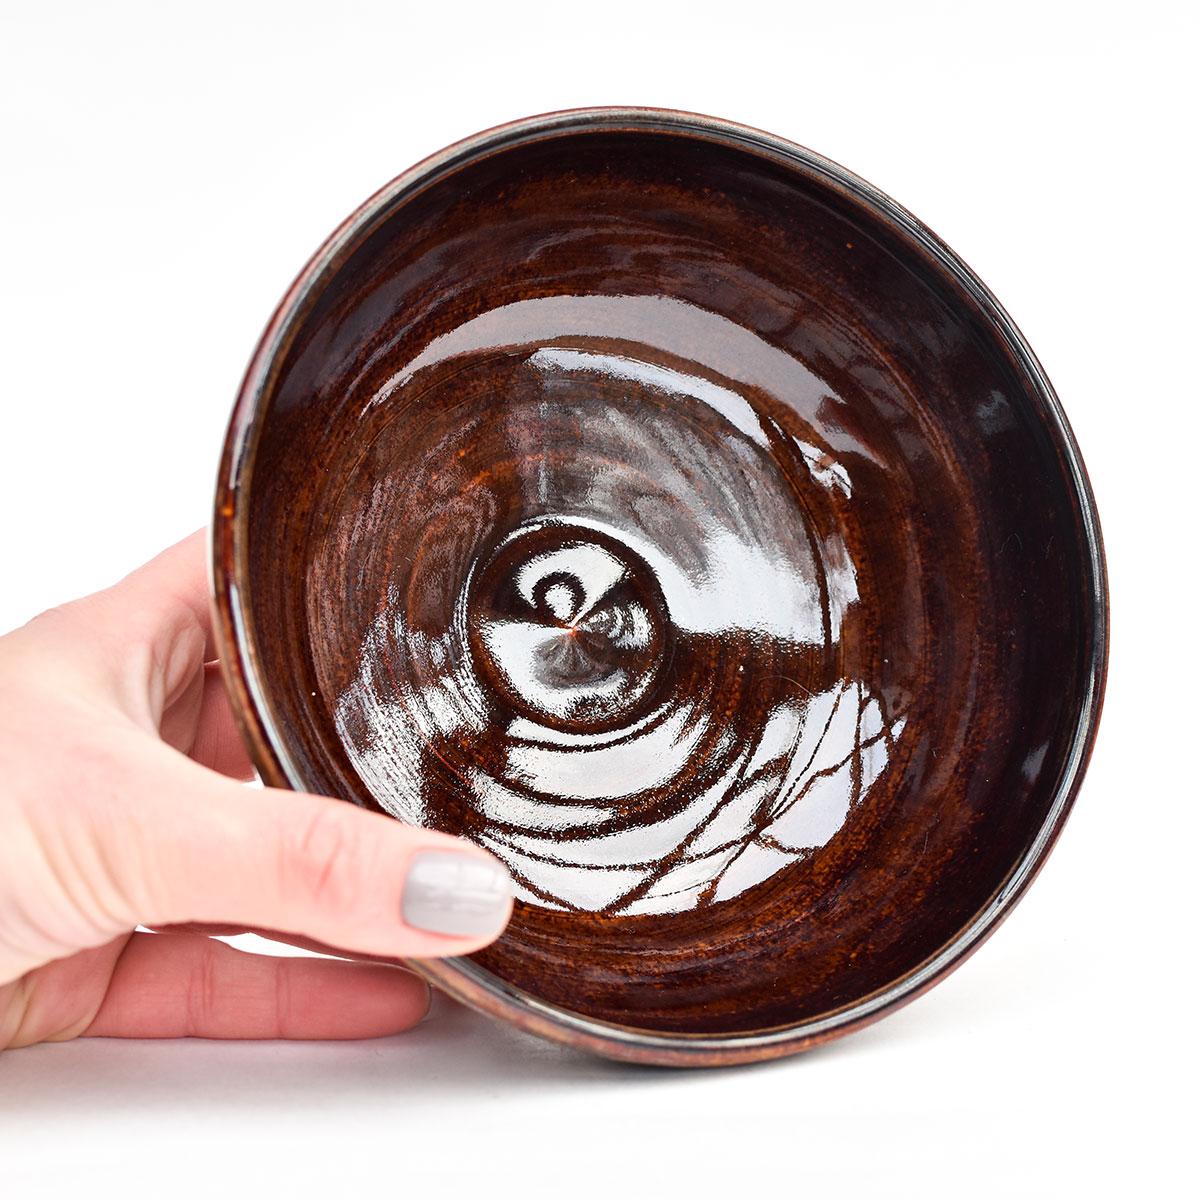 картинка Керамический салатник Натальи Астаховой 3 - DishWishes.Ru